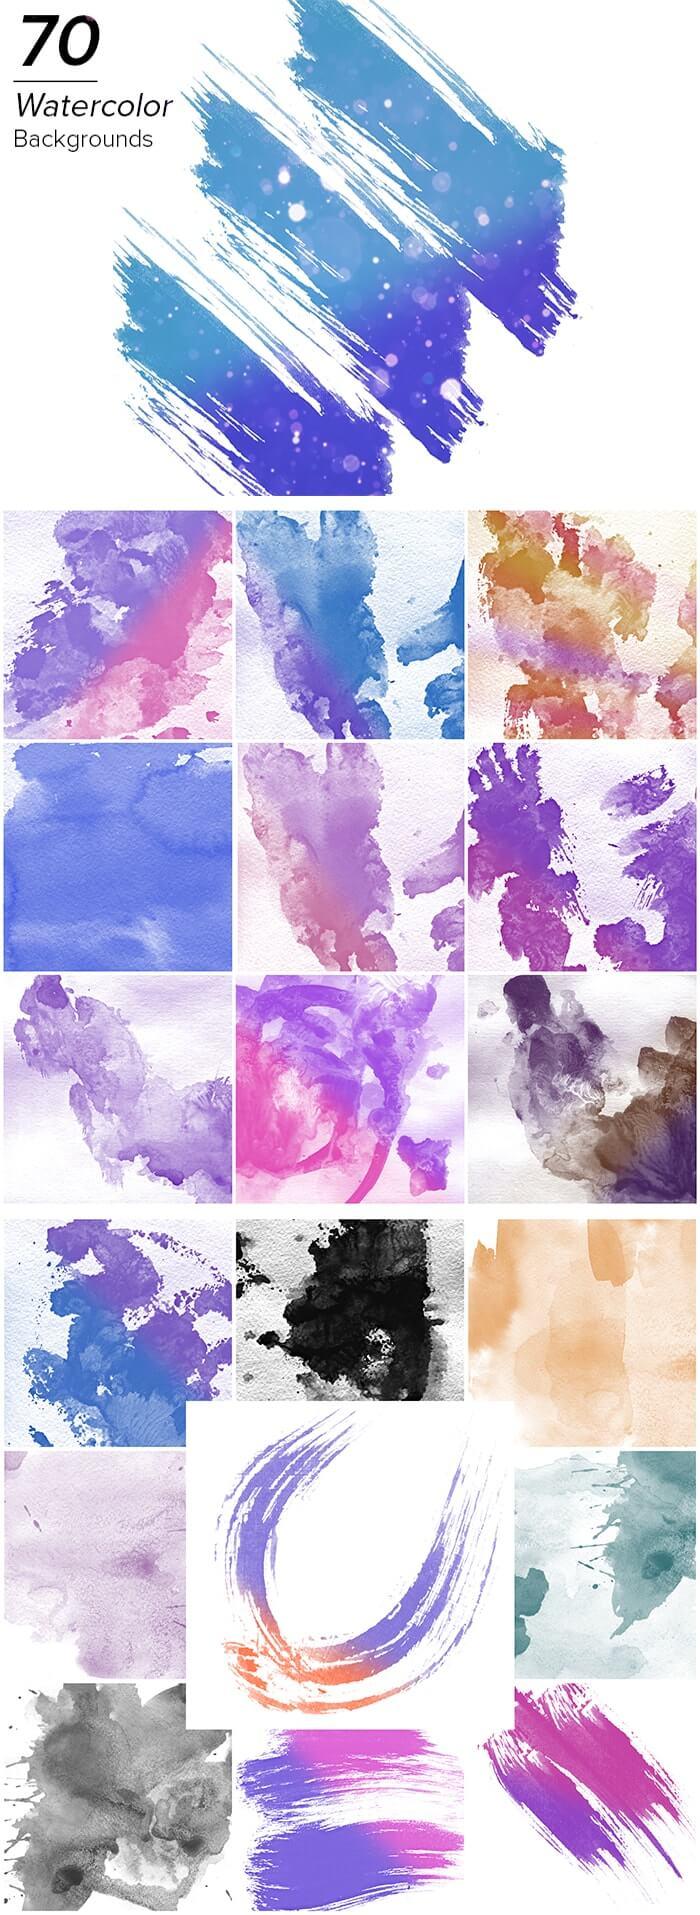 2000+ High Resolution Digital Backgrounds Bundle - $29 - 70 Watercolor Backgrounds